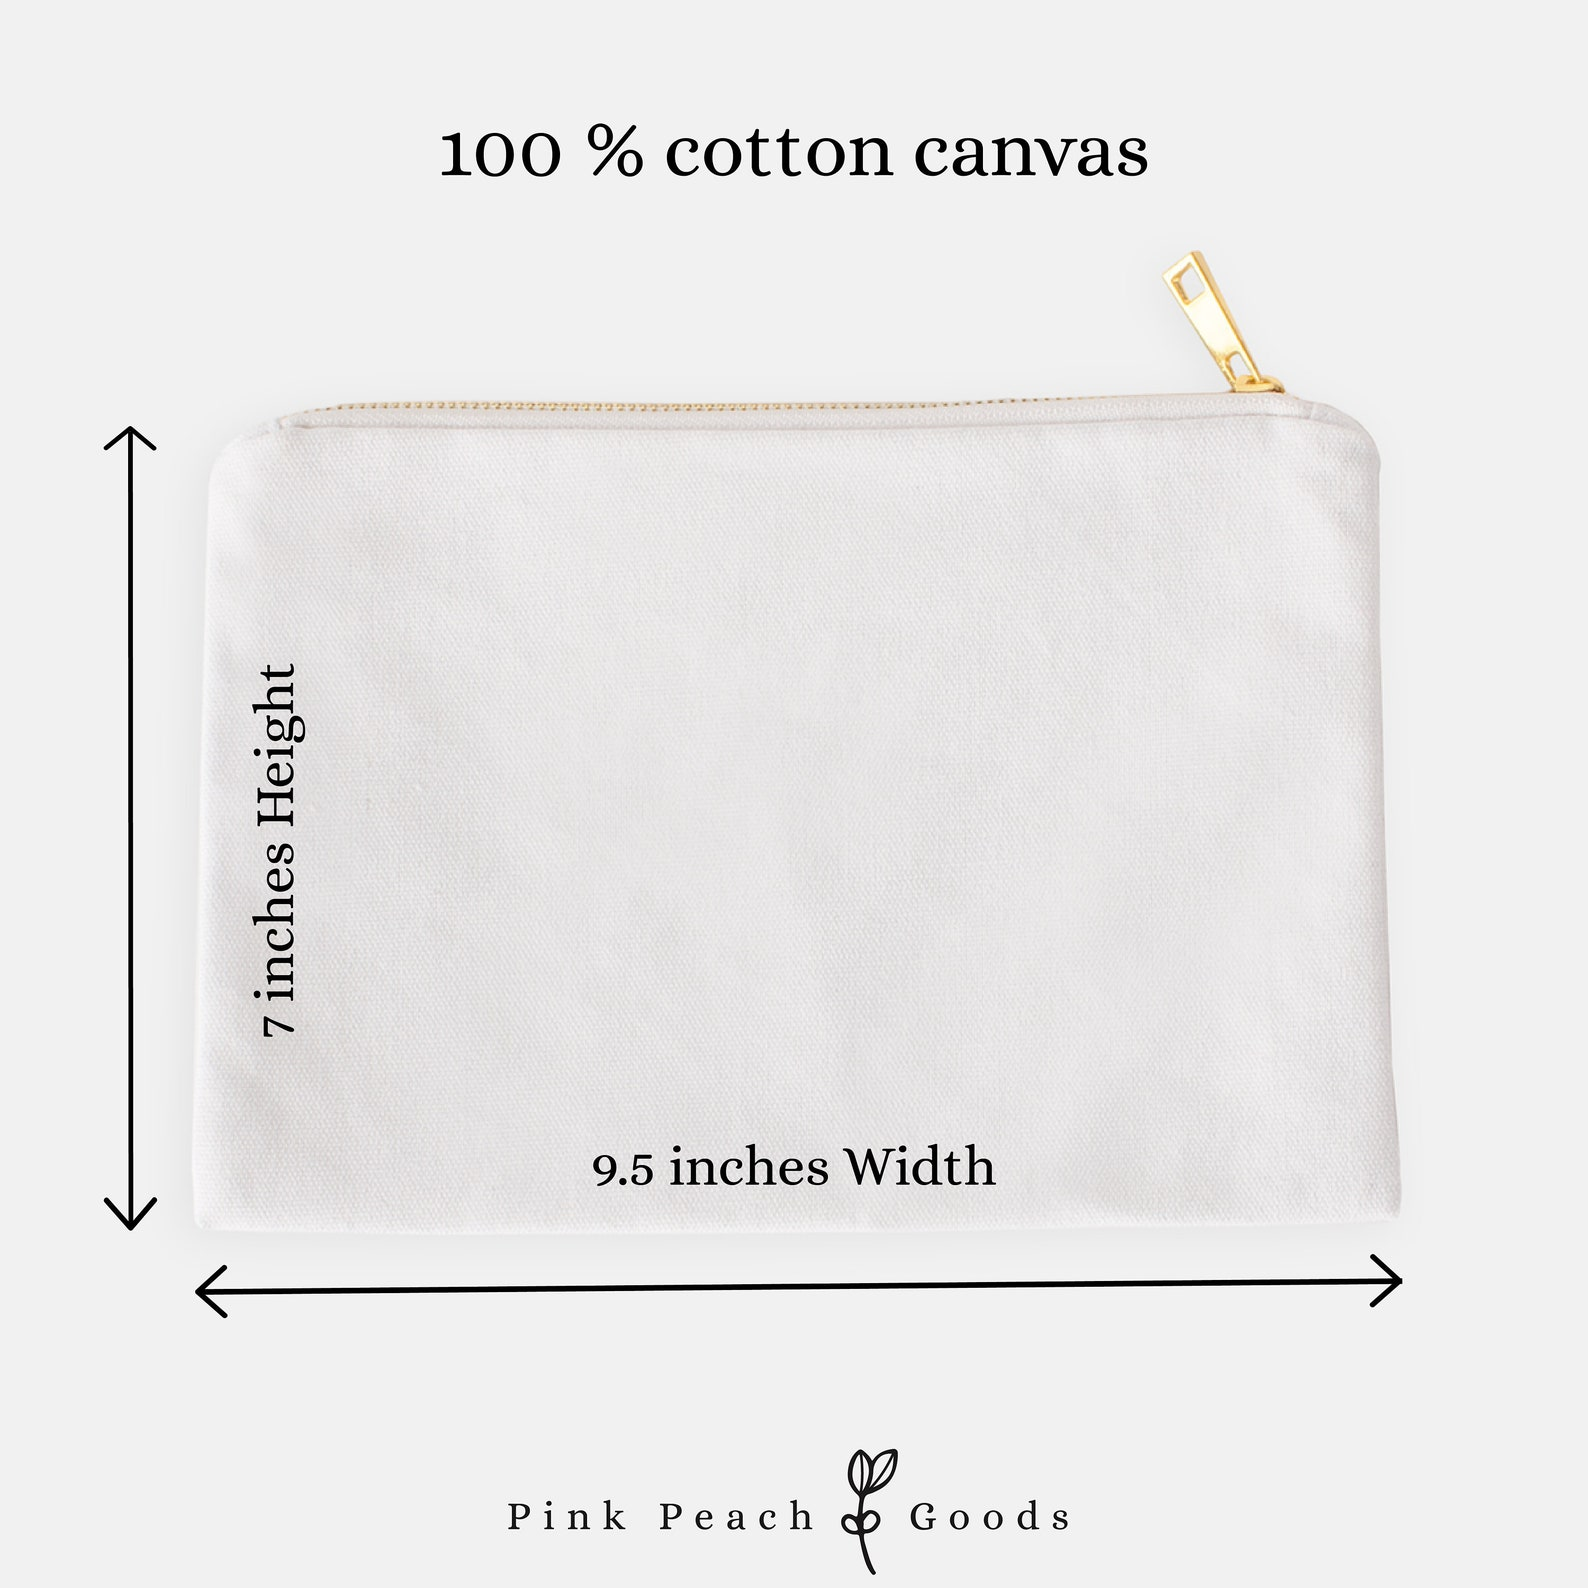 ballet bag, pouch, pencil pouch, pencil case, custom, cosmetic bag, personalized cosmetic bag, makeup bag, make up bag, cotton p